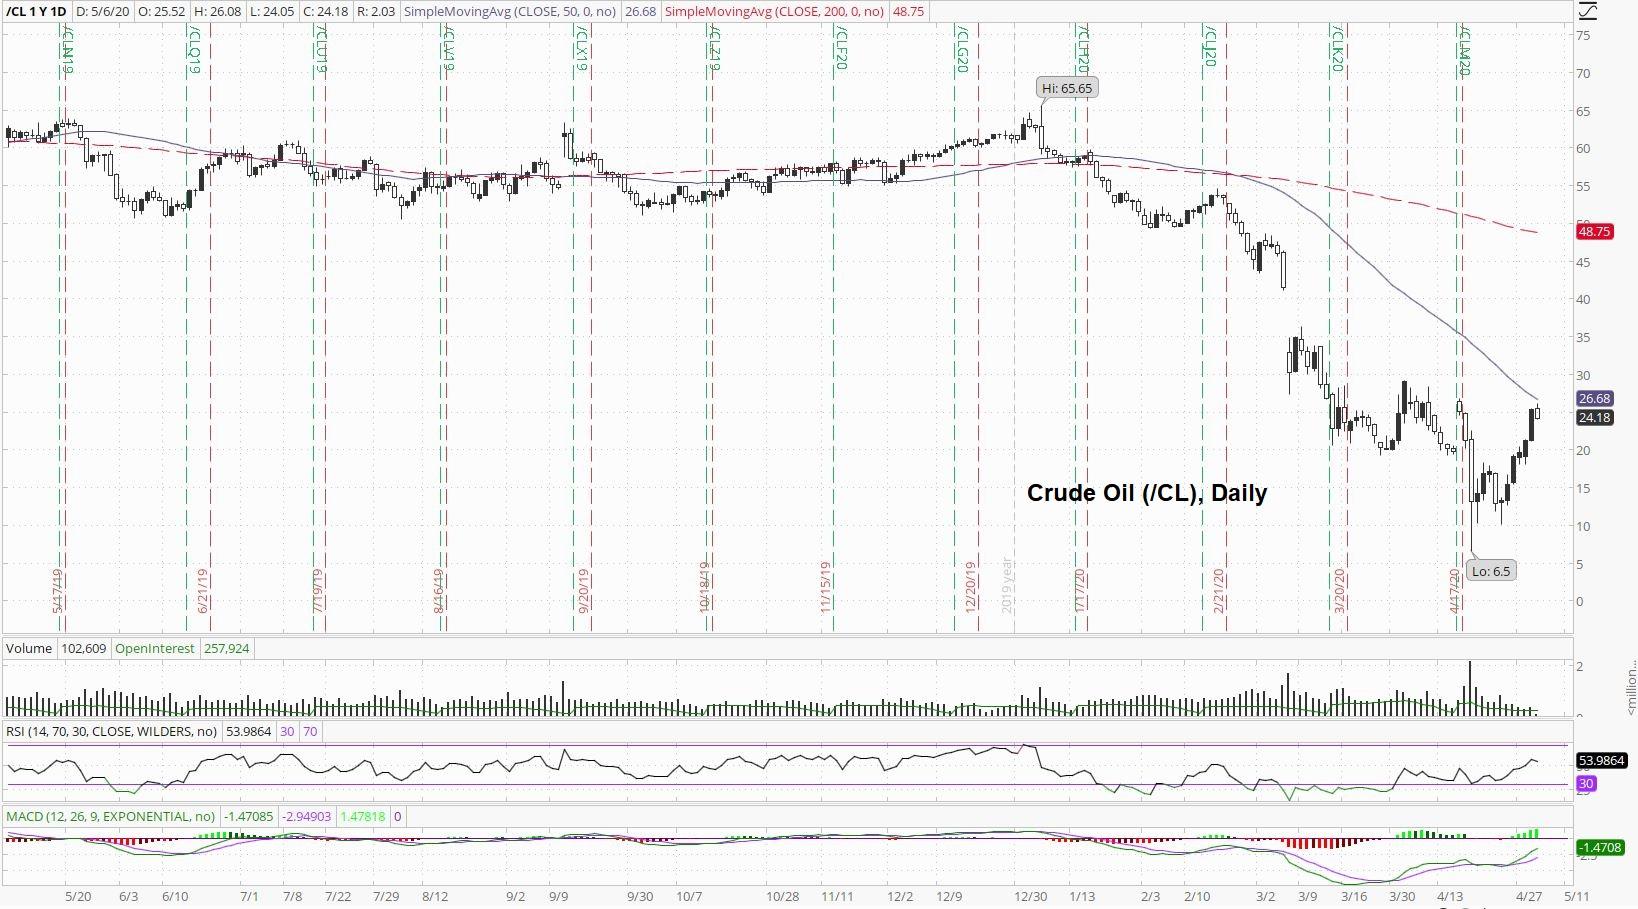 Crude Oil Daily